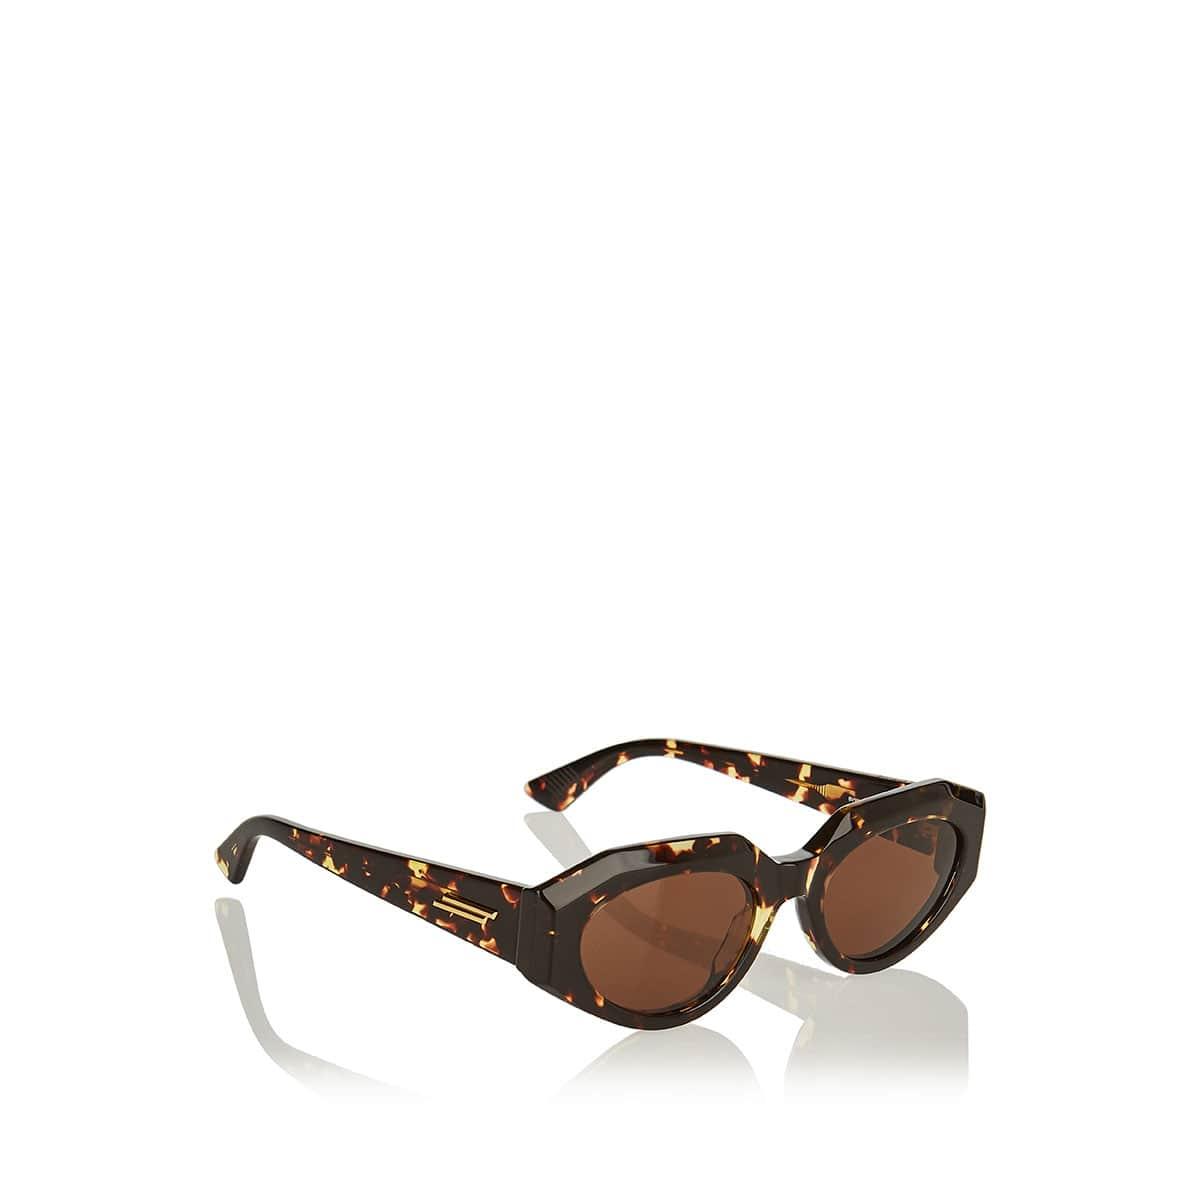 Oversized acetate sunglasses